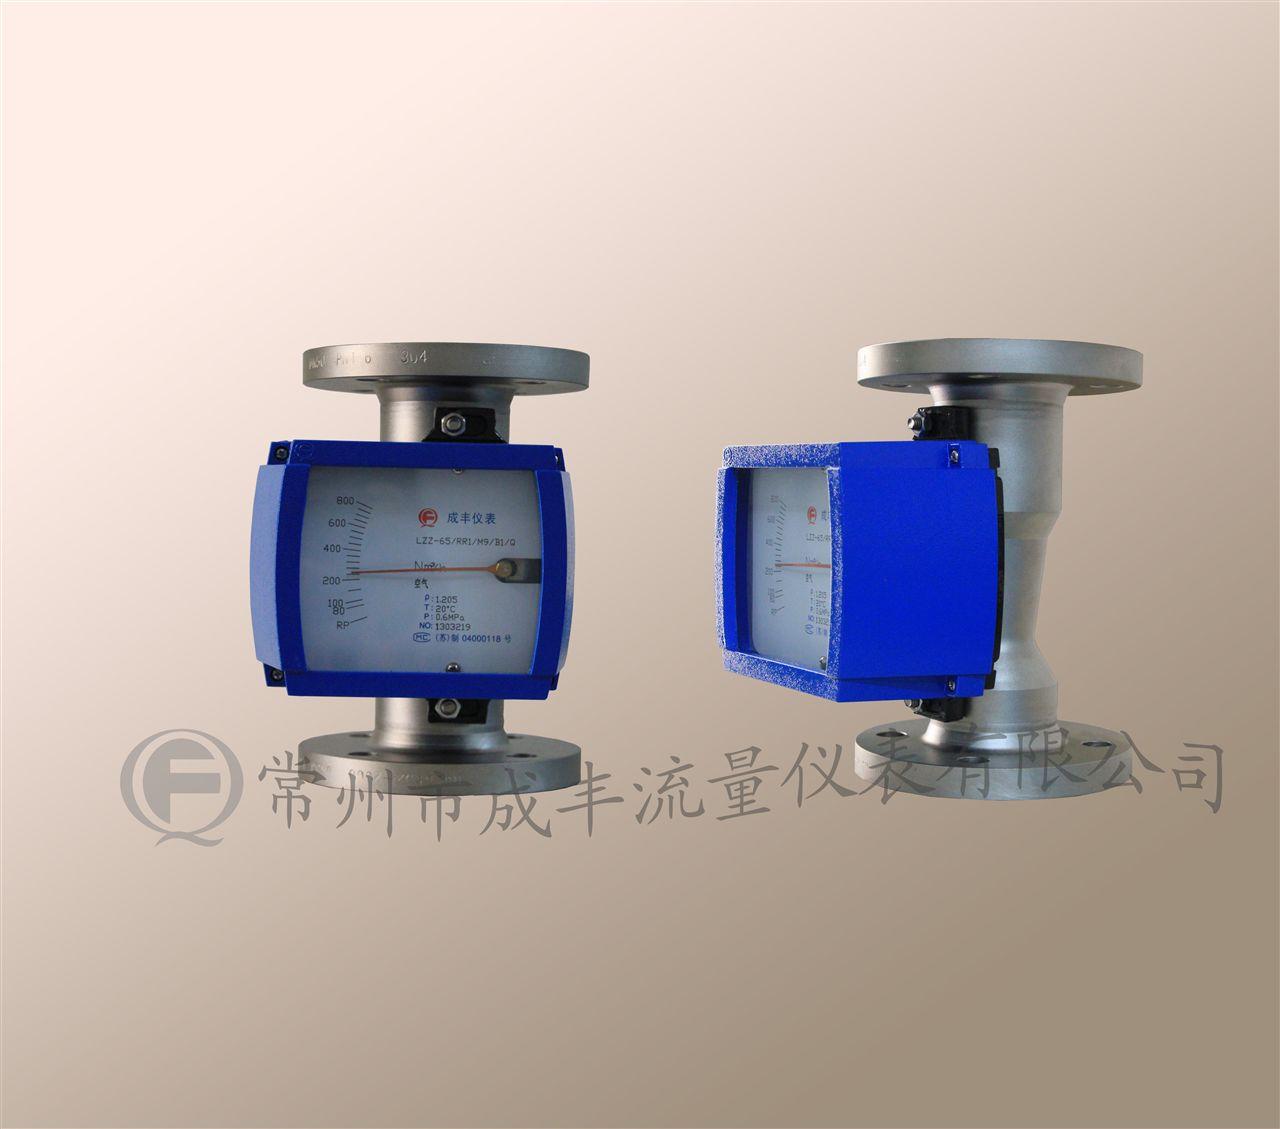 LZZ-50(316L)-第三代金屬管浮子流量計316L能耐腐蝕,【常州成豐】可以造